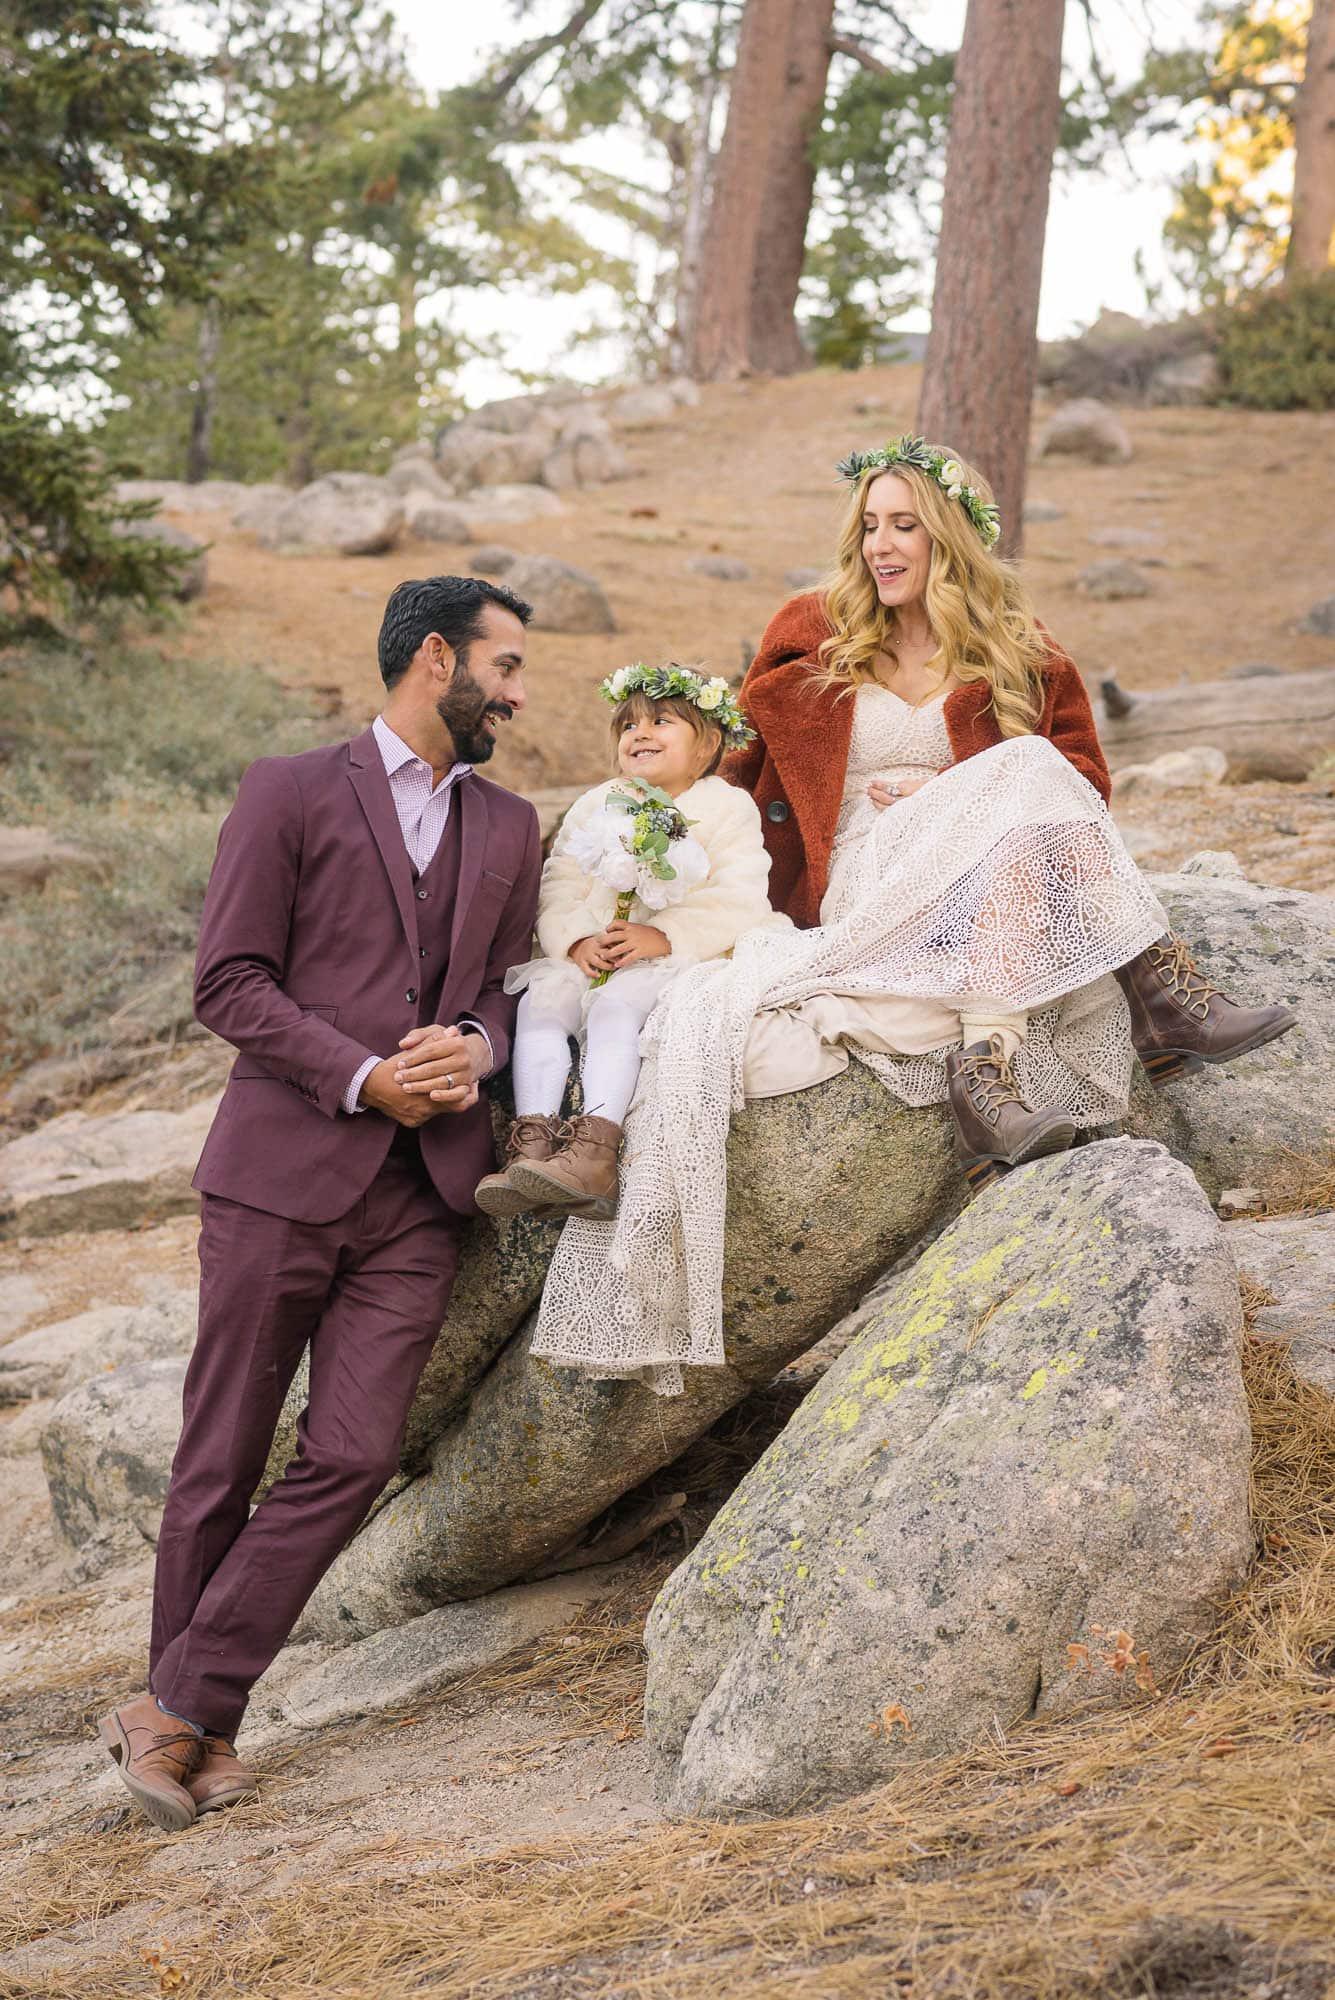 042_Alan_and_Heidi_Wedding_Natalie_Mike